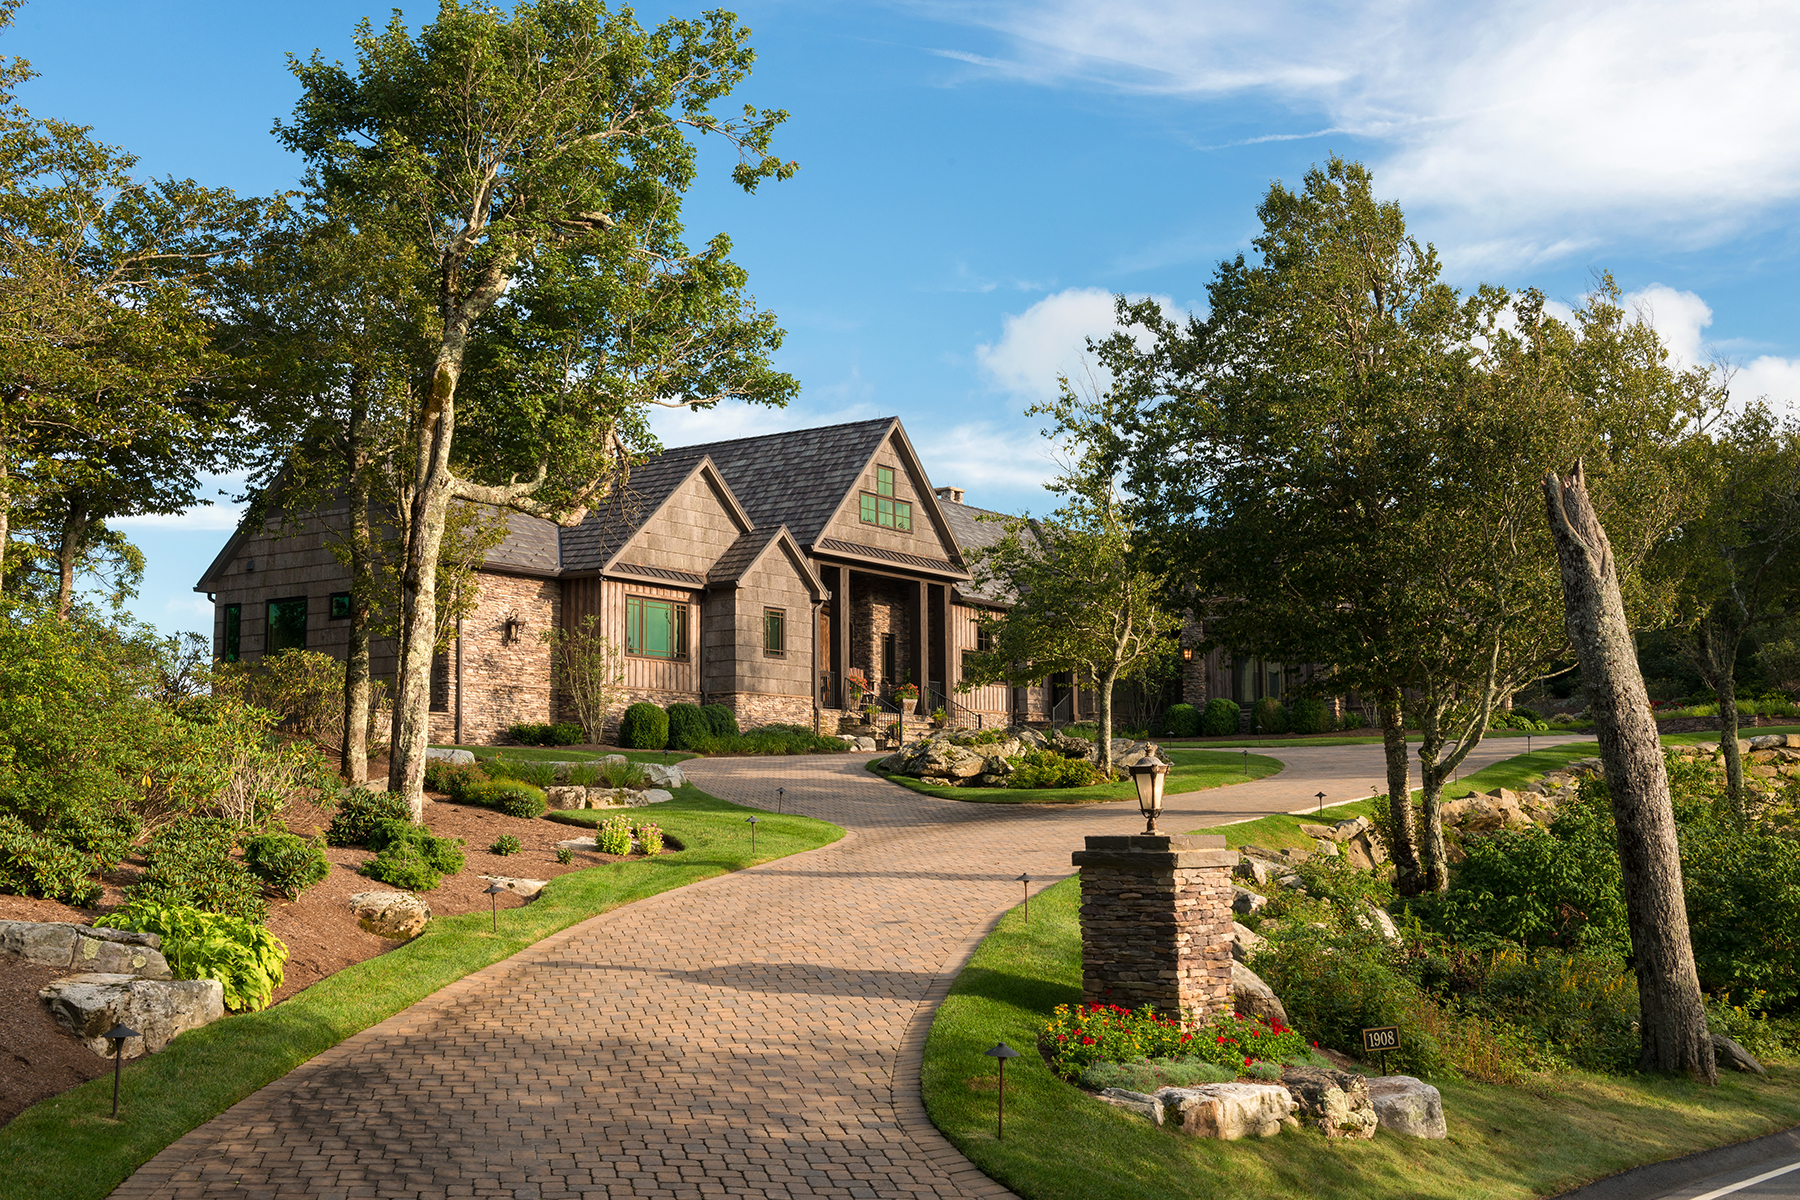 Single Family Home for Sale at LINVILLE RIDGE 1908 Flattop Cliffs Drive Linville, North Carolina, 28646 United States